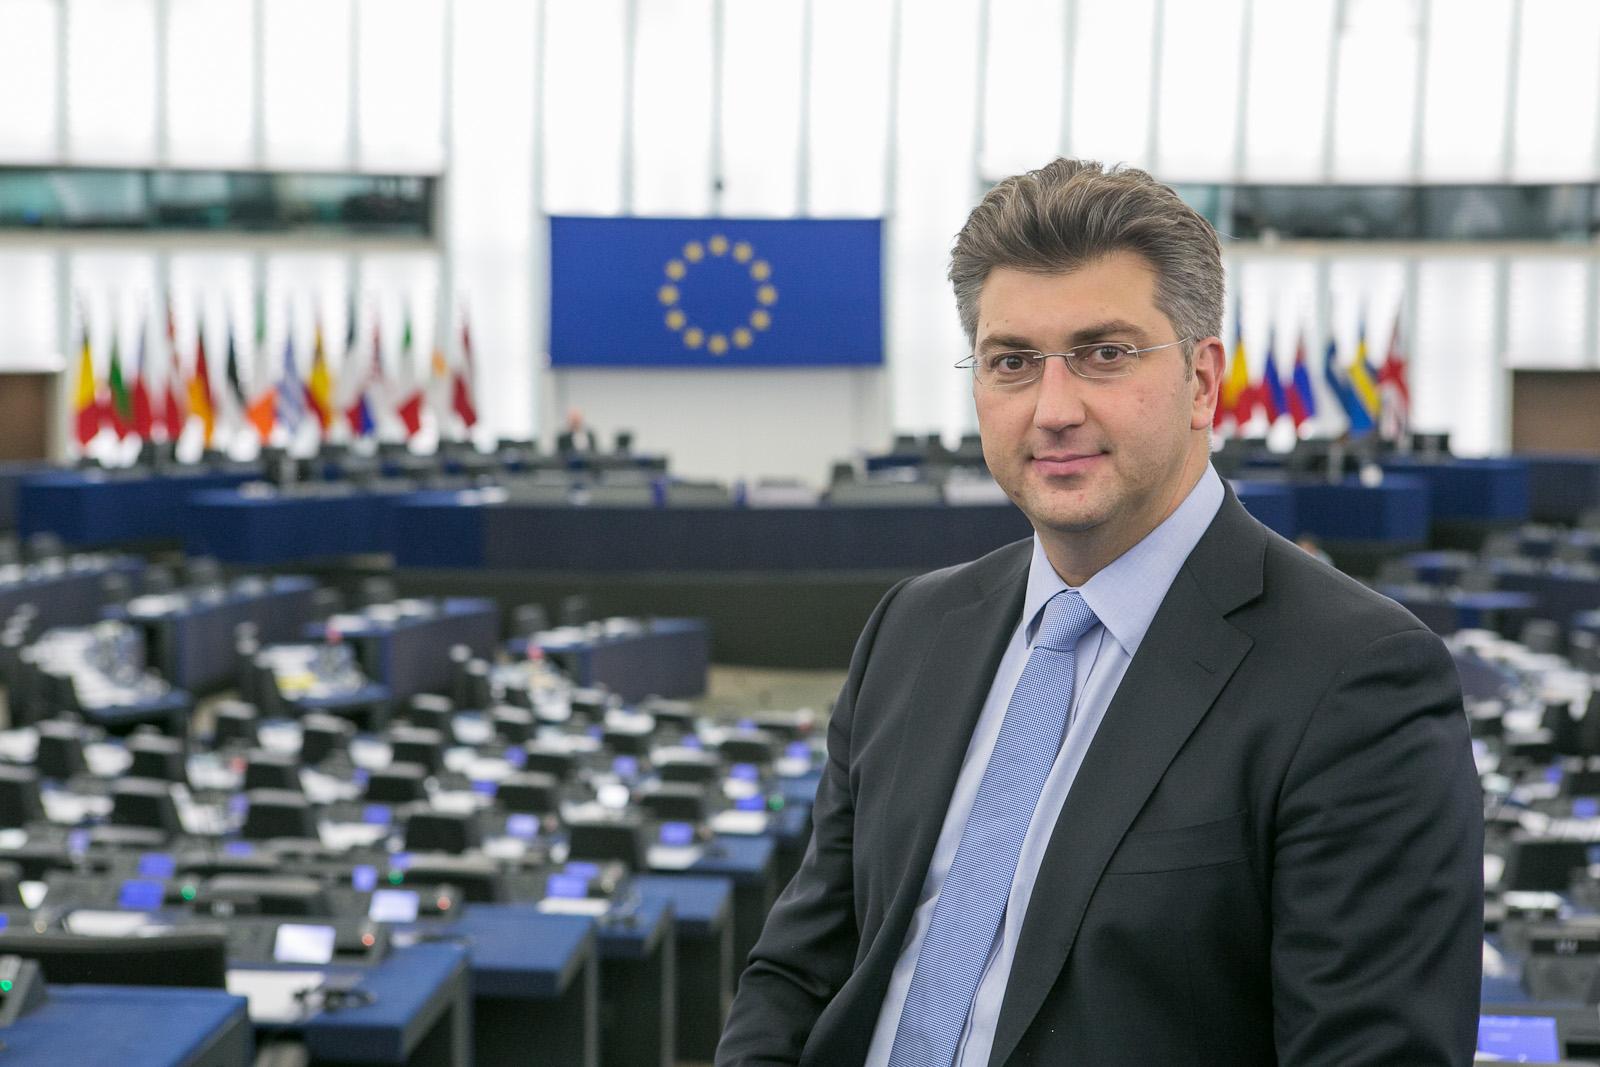 Joining the EU has improved Croatian economy, PMPlenković says